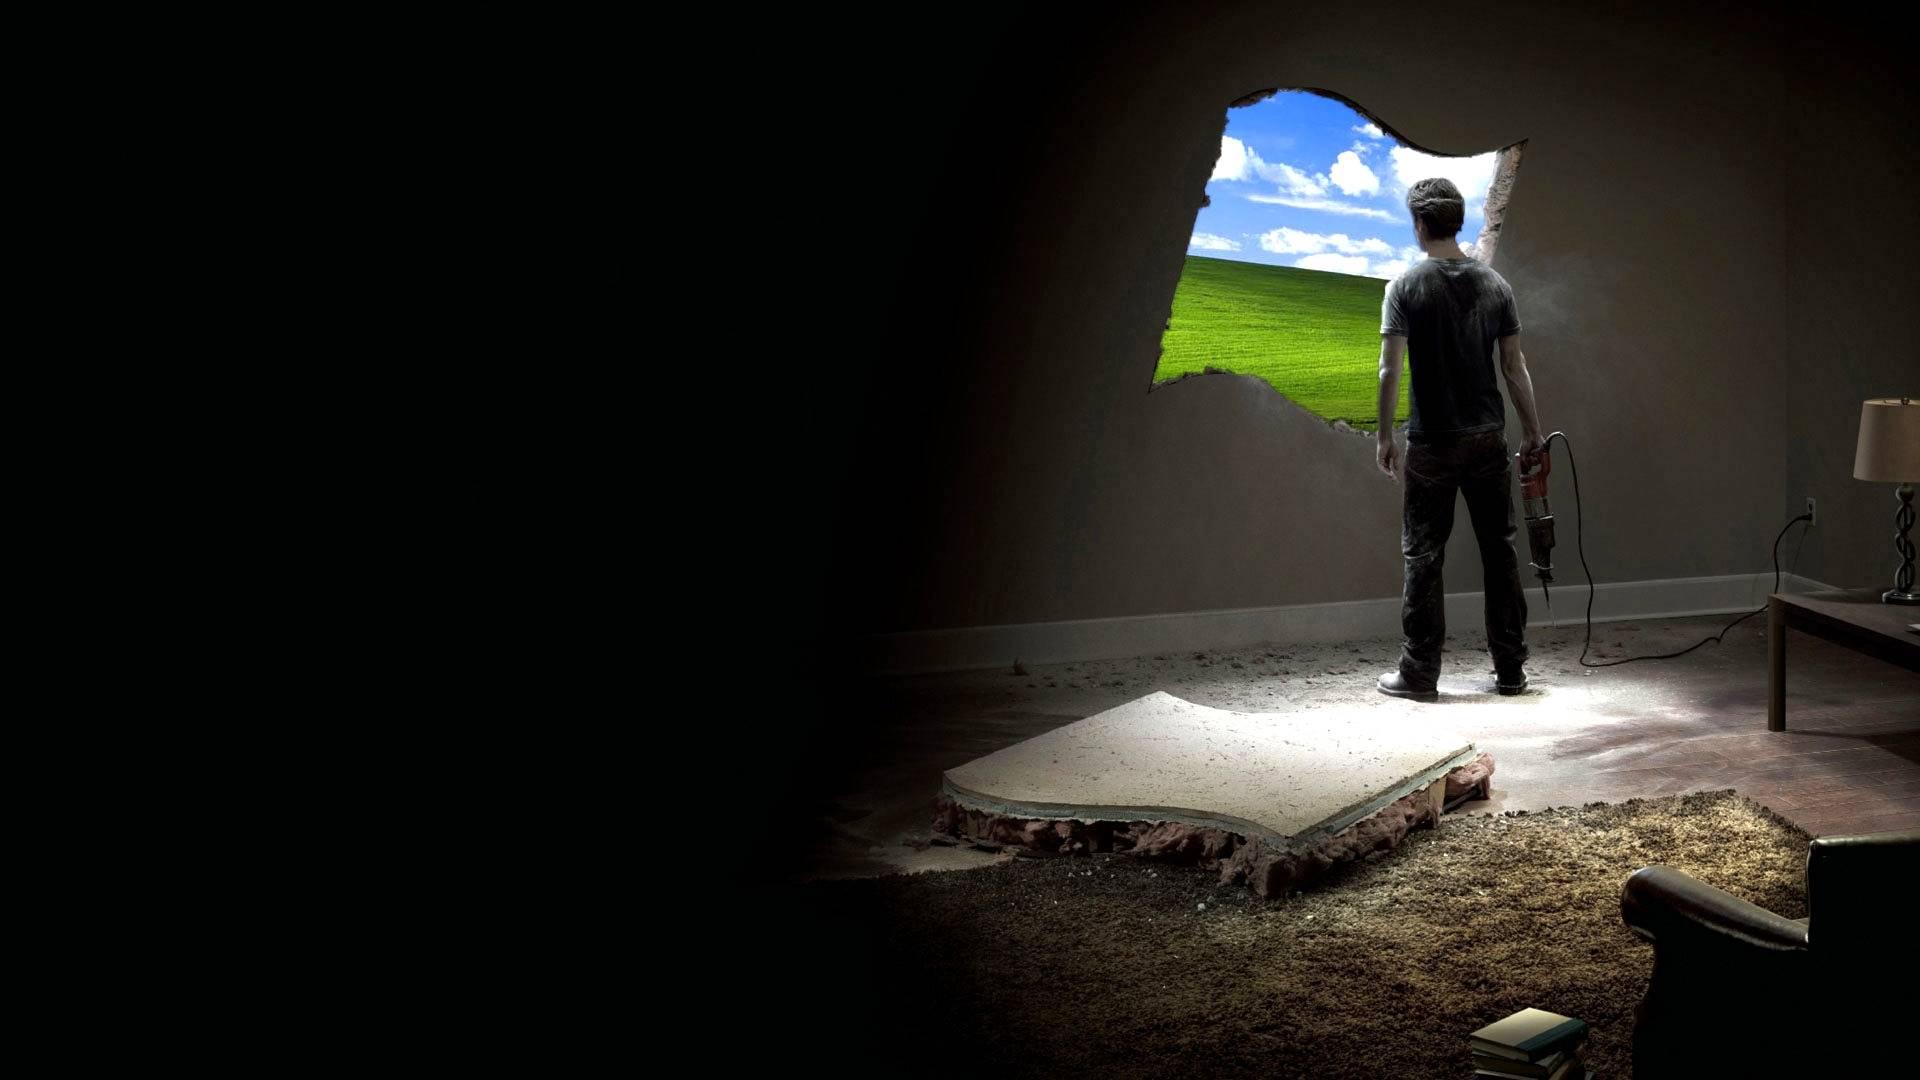 обои стена, мужик с перфоратором, windows картинки фото